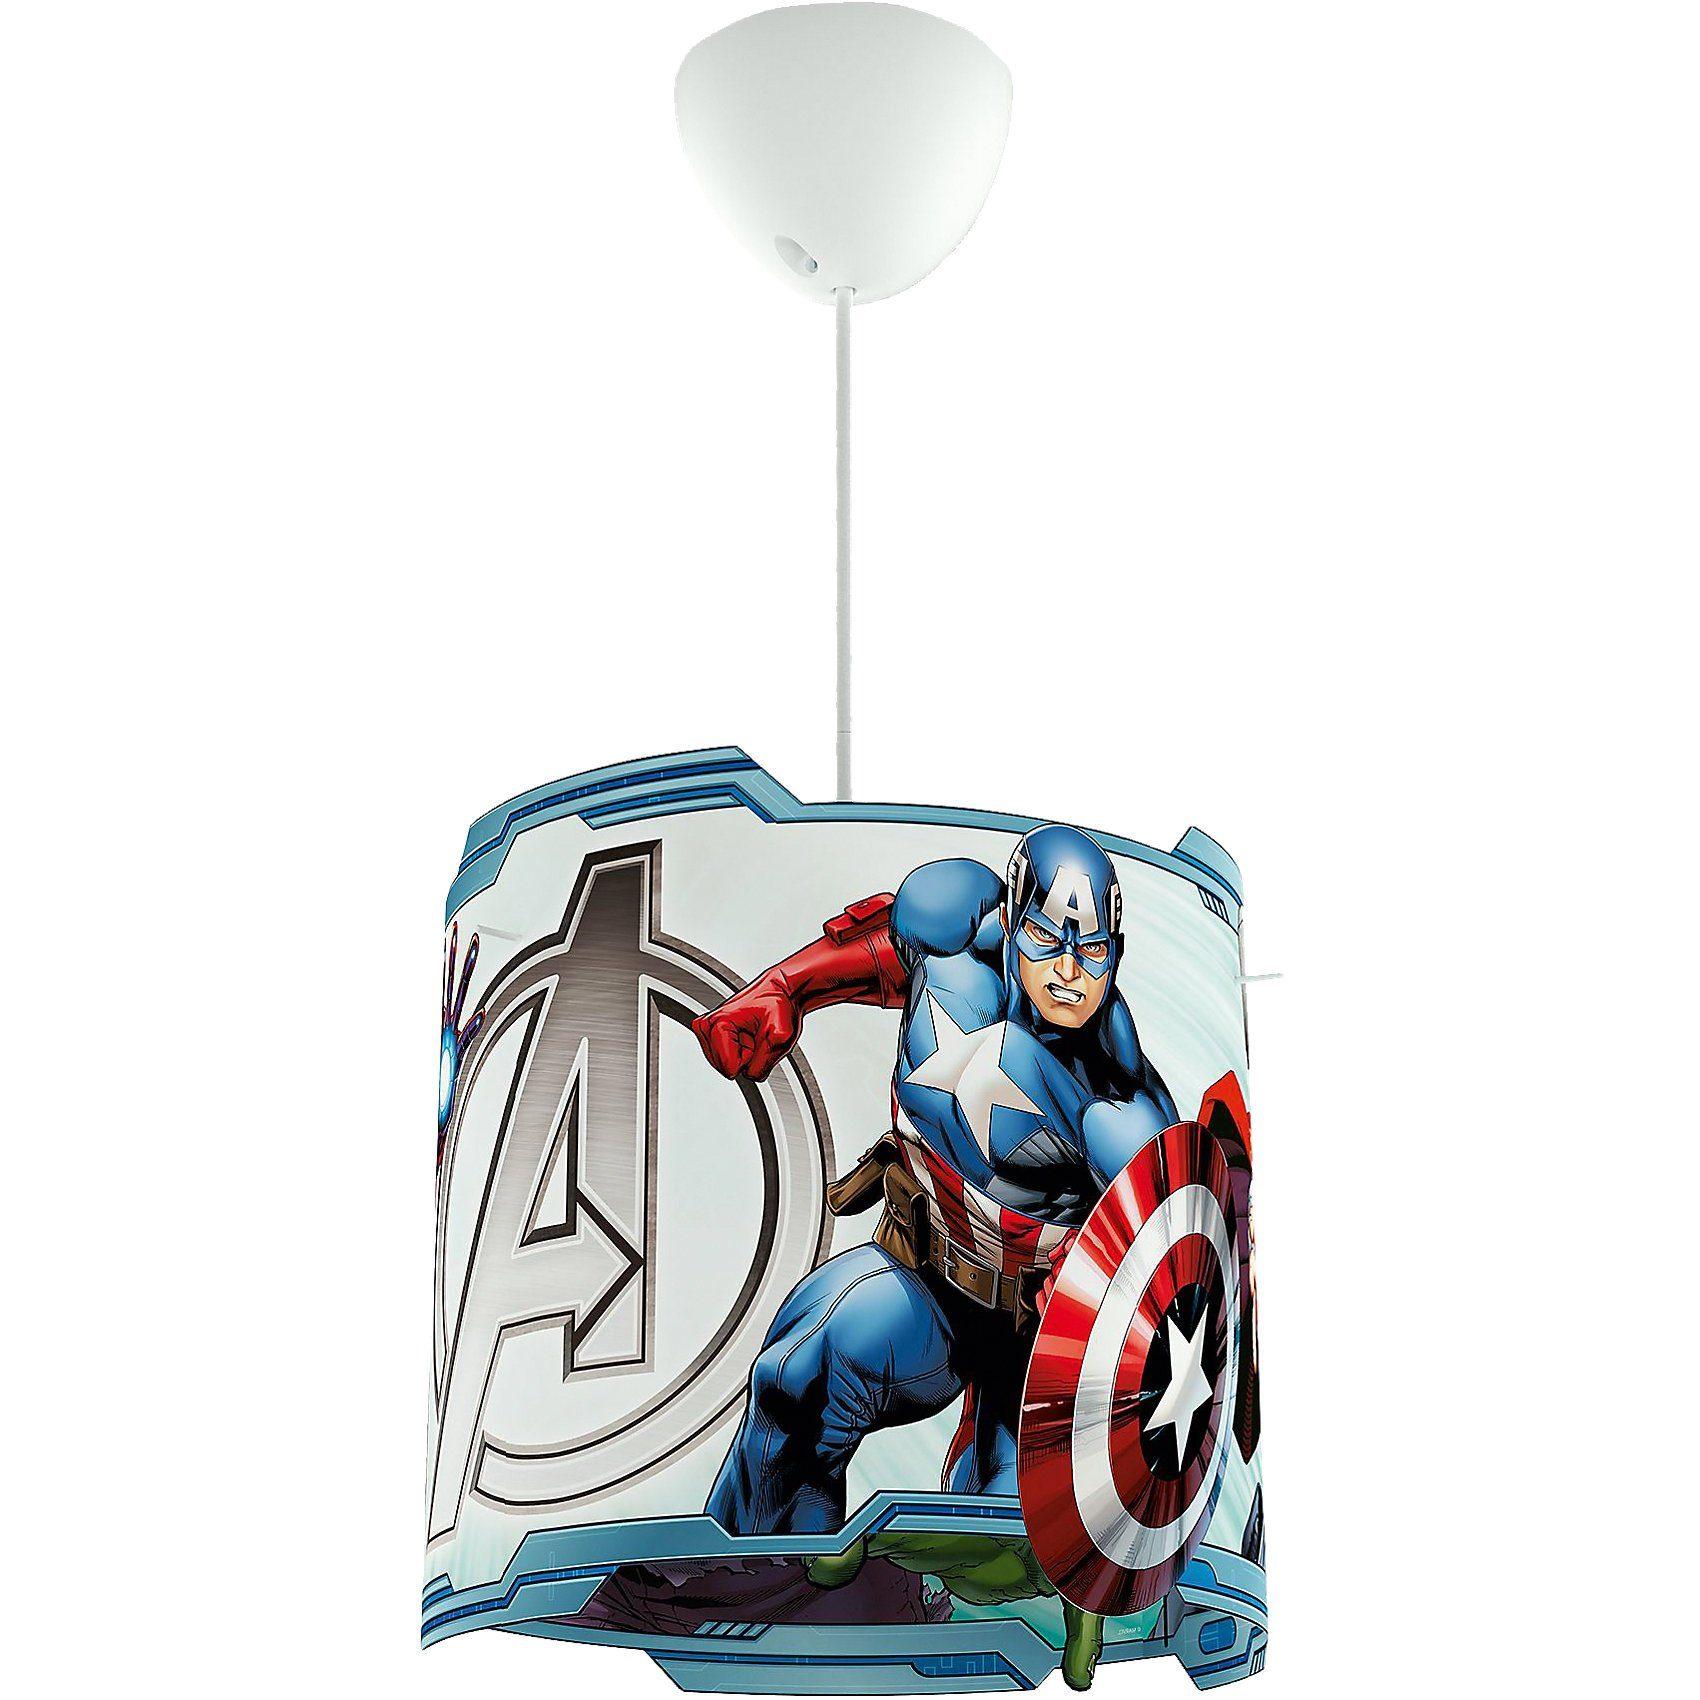 Philips Lighting Hängelampe, The Avengers